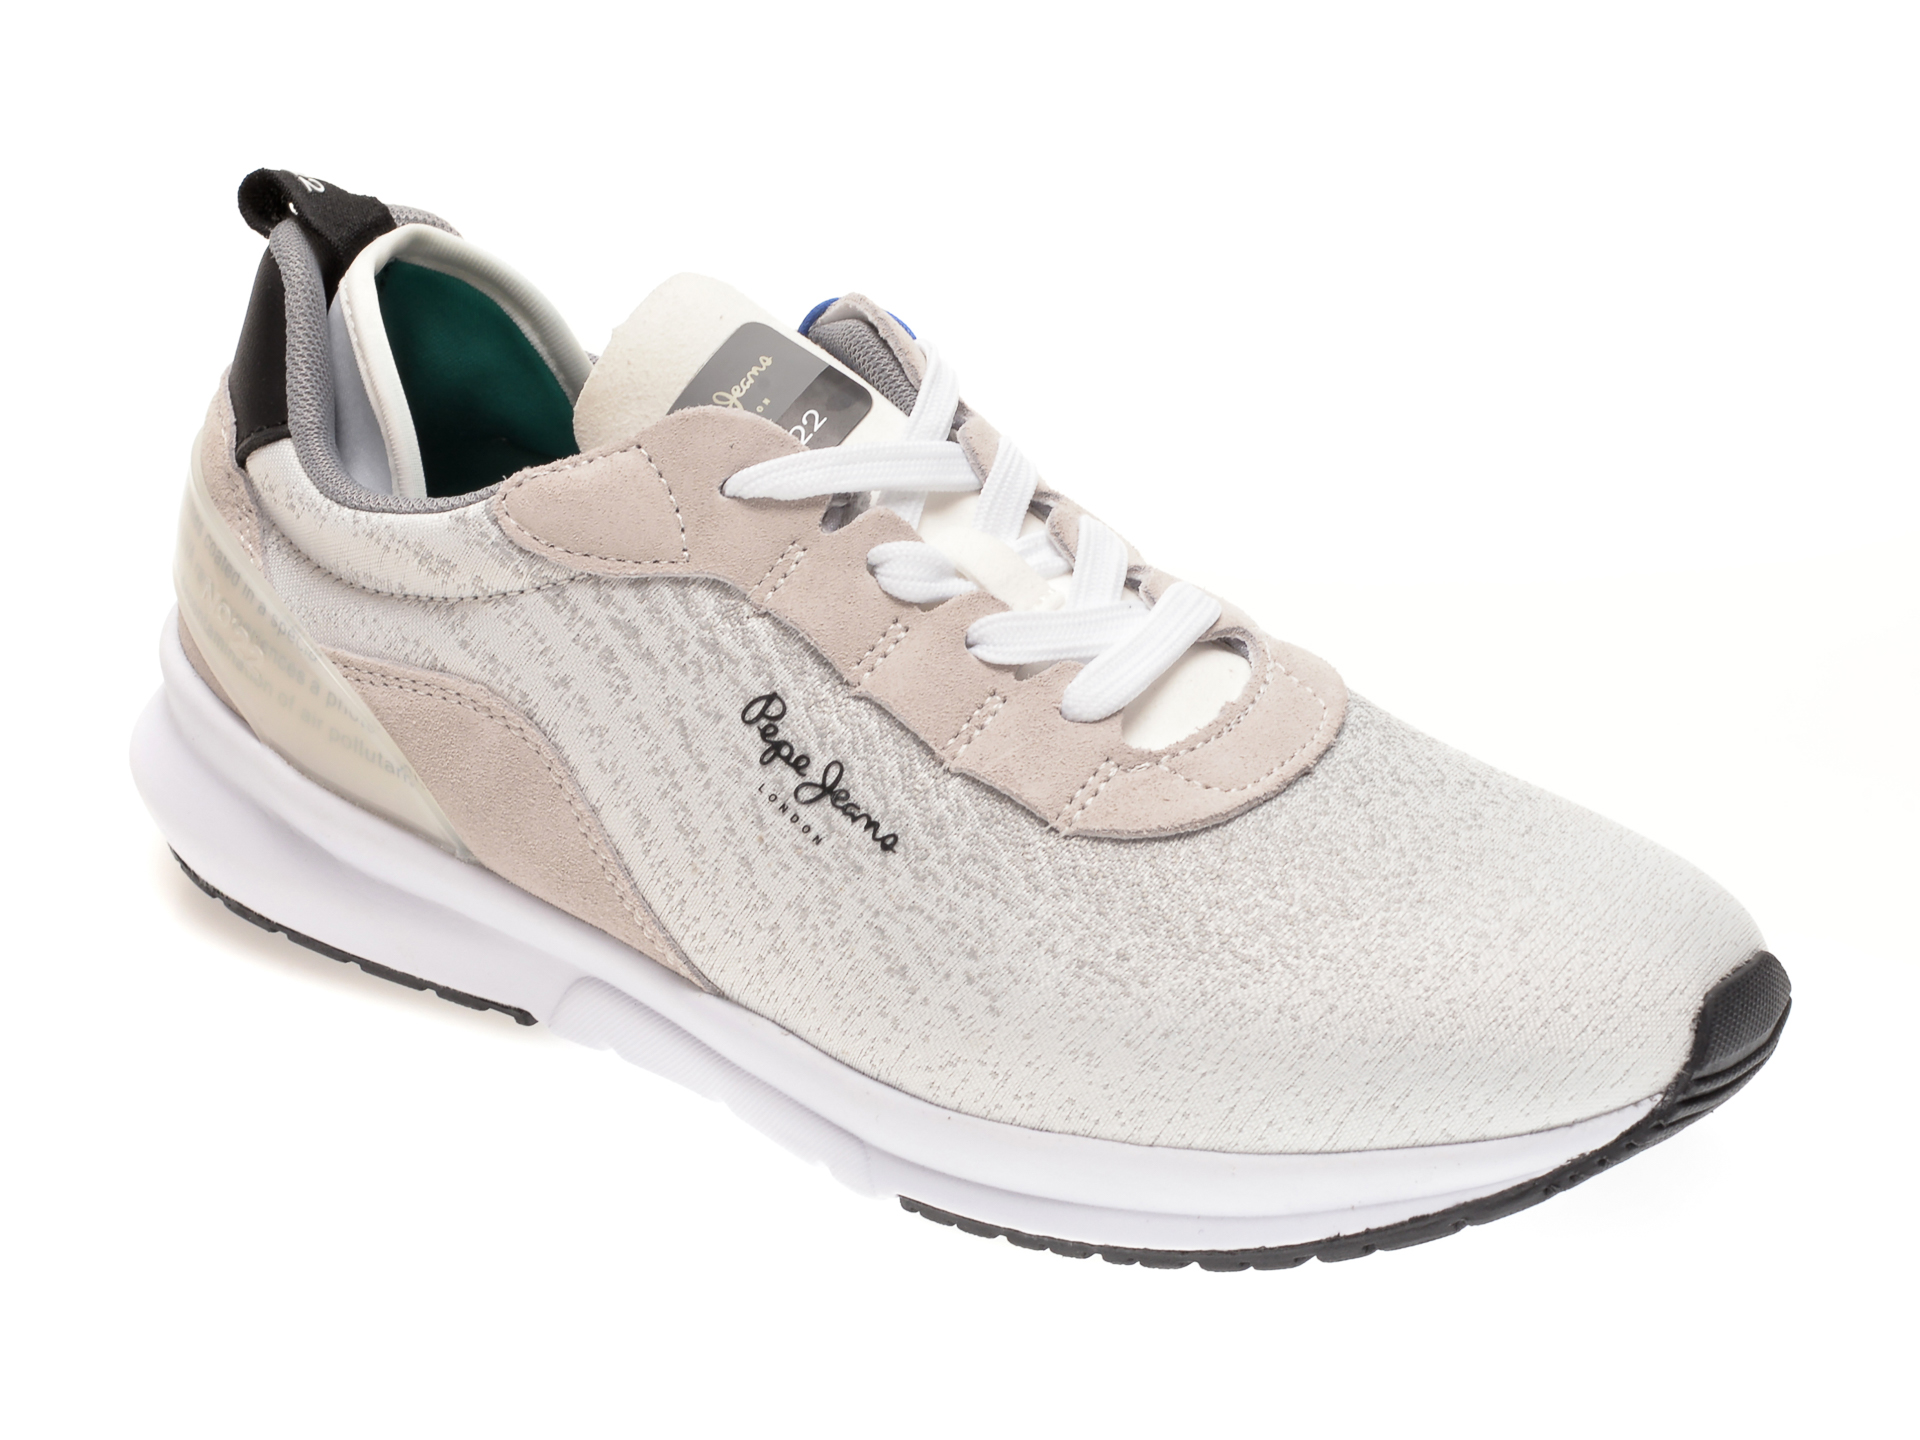 Pantofi sport PEPE JEANS albi, MS30694, din material textl